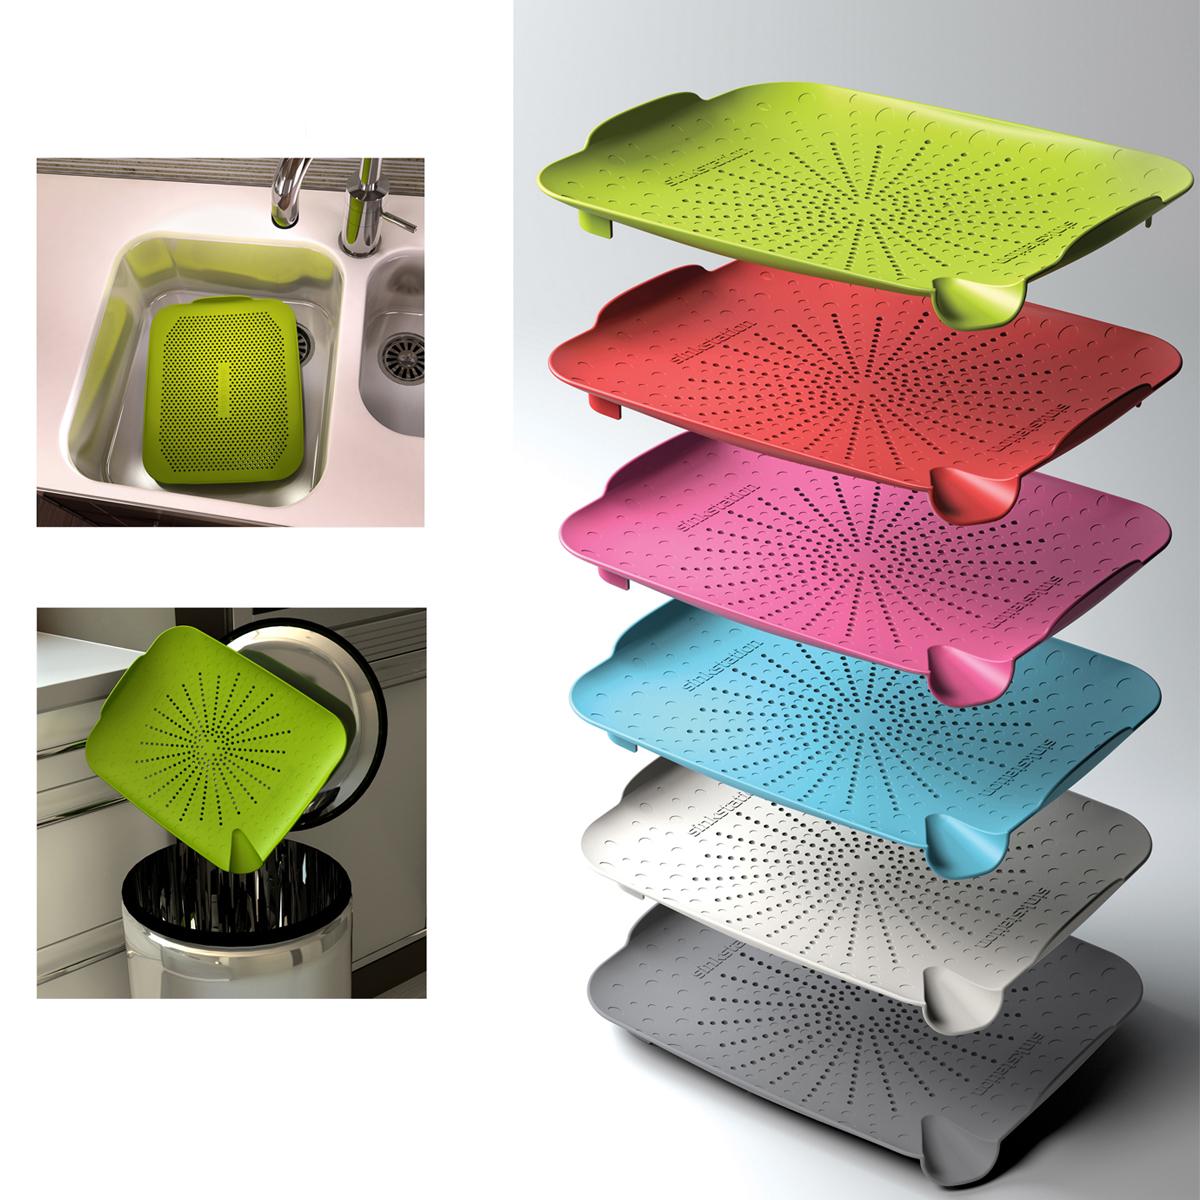 neu heim sinkstation flach sieb k che sp le filter essen f nger ebay. Black Bedroom Furniture Sets. Home Design Ideas